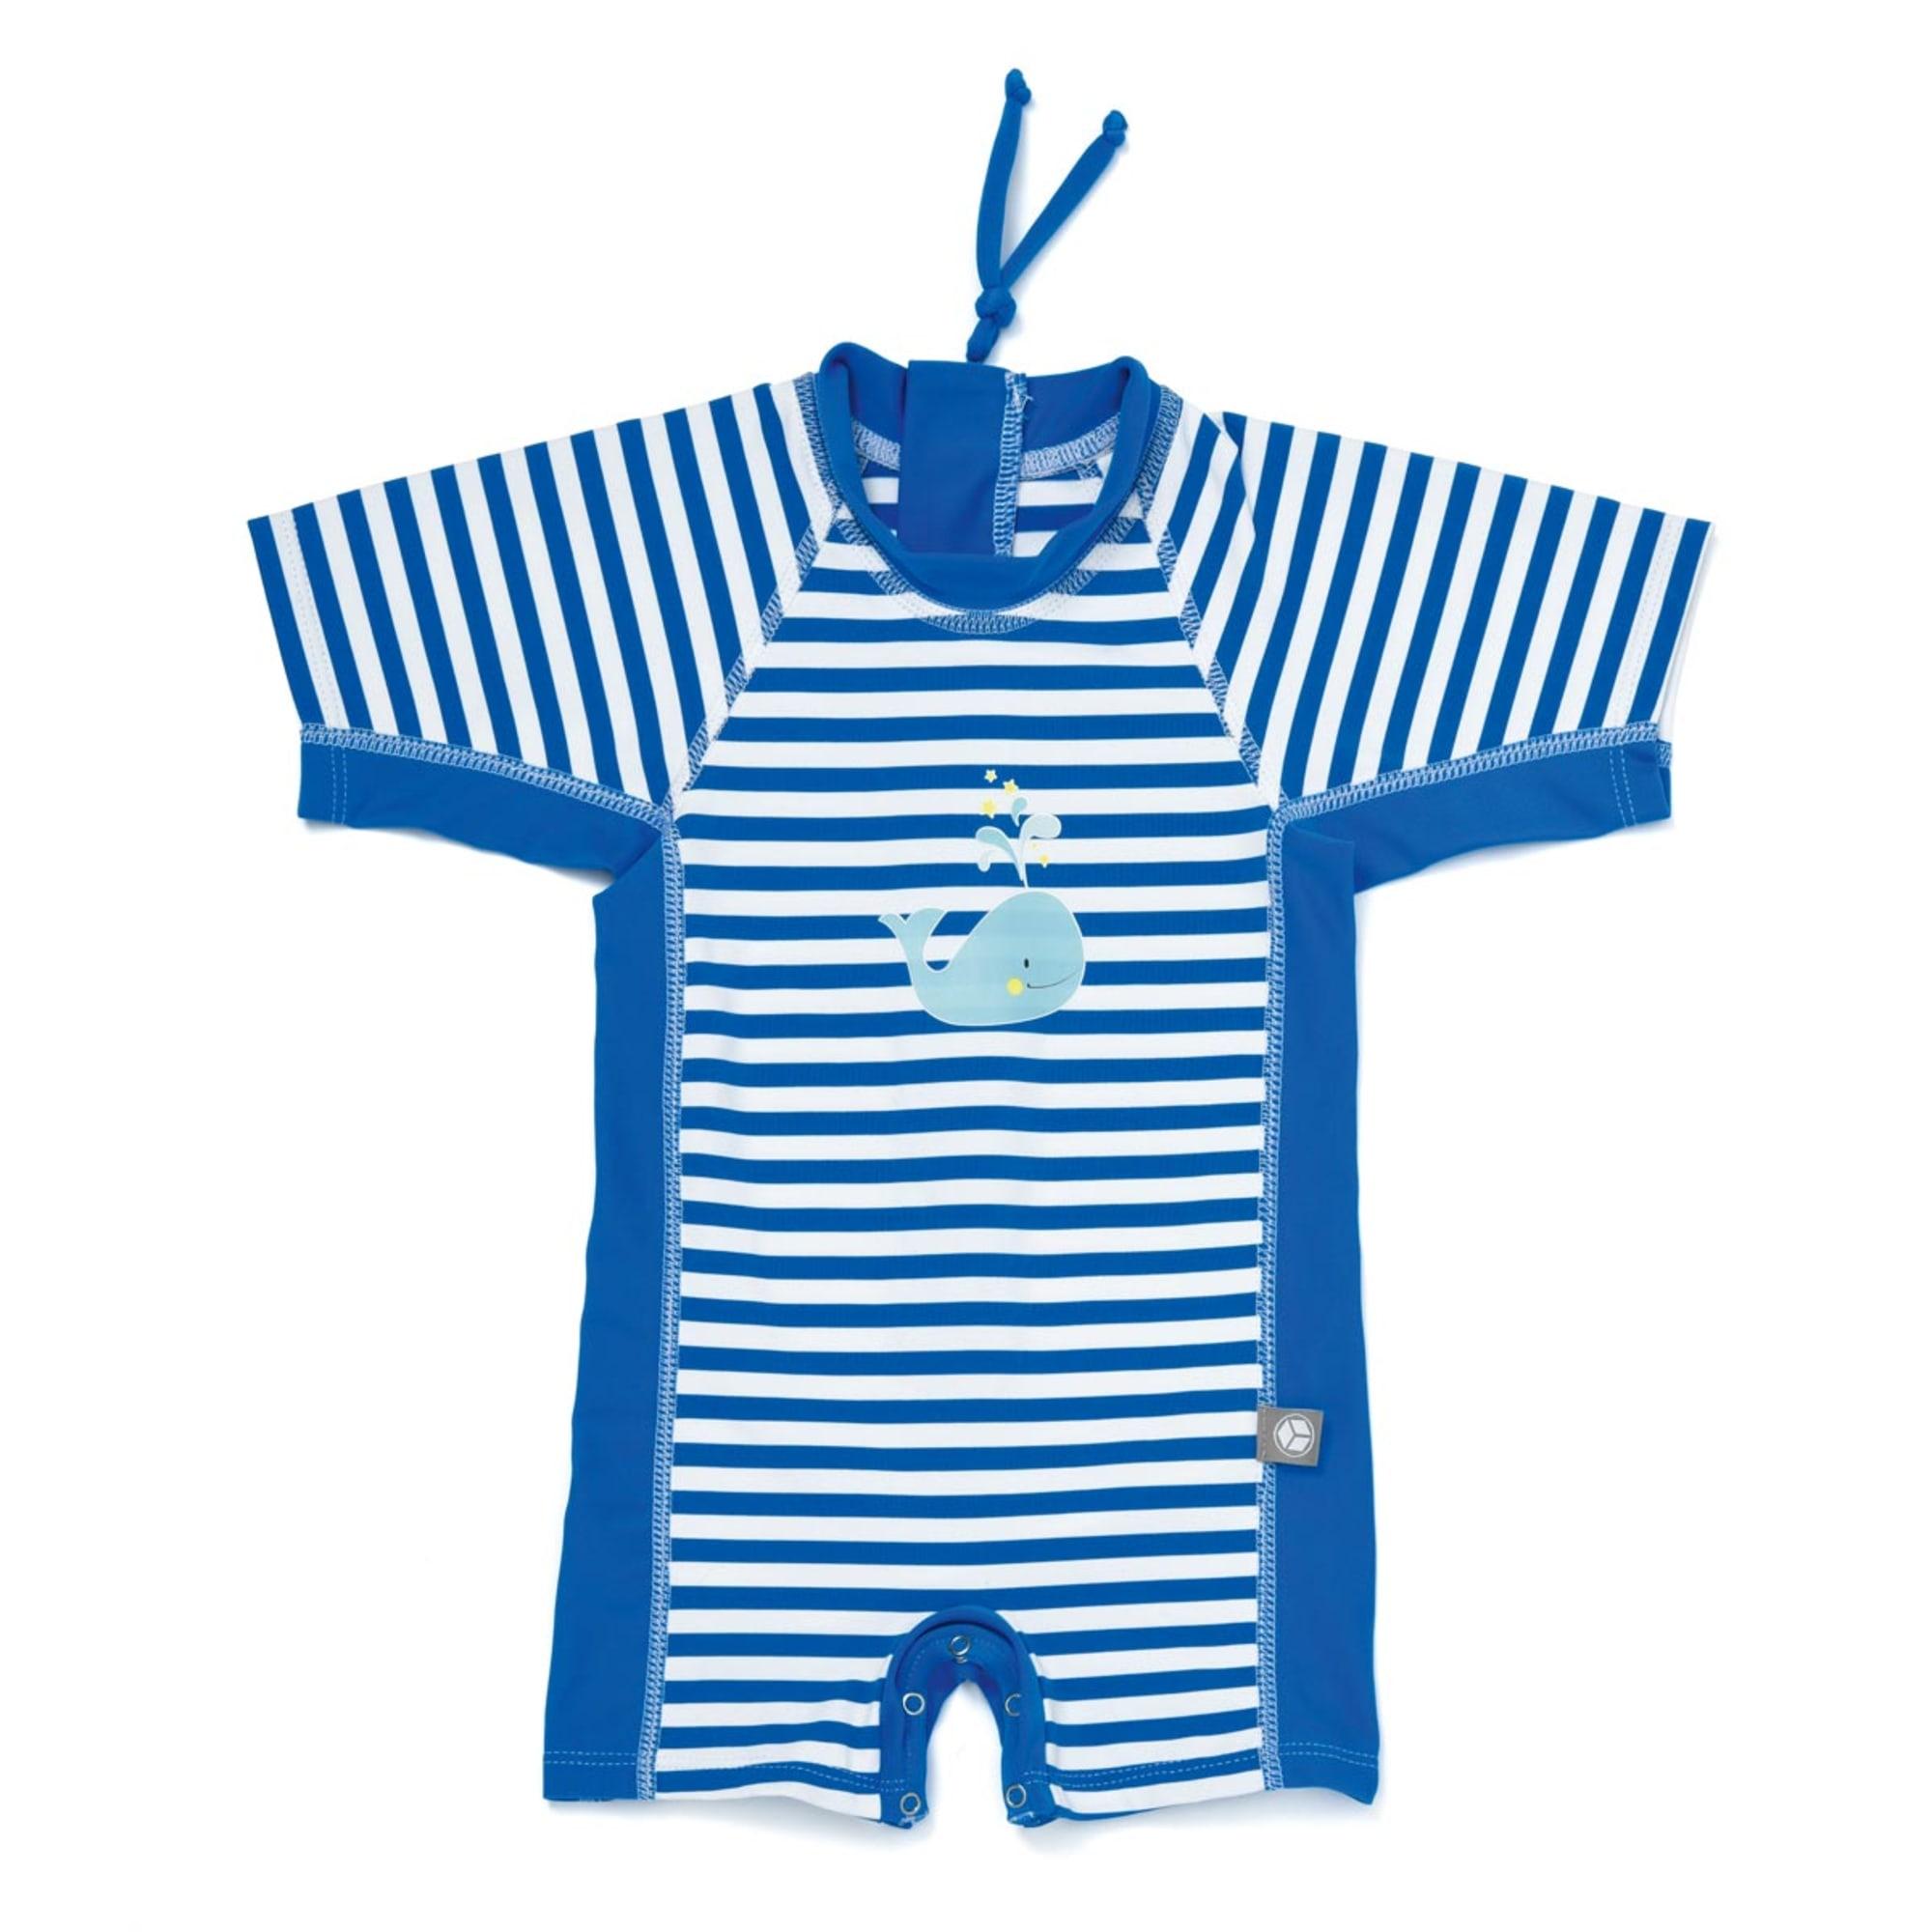 Short de bain OXYBUL Bleu, bleu marine, bleu turquoise